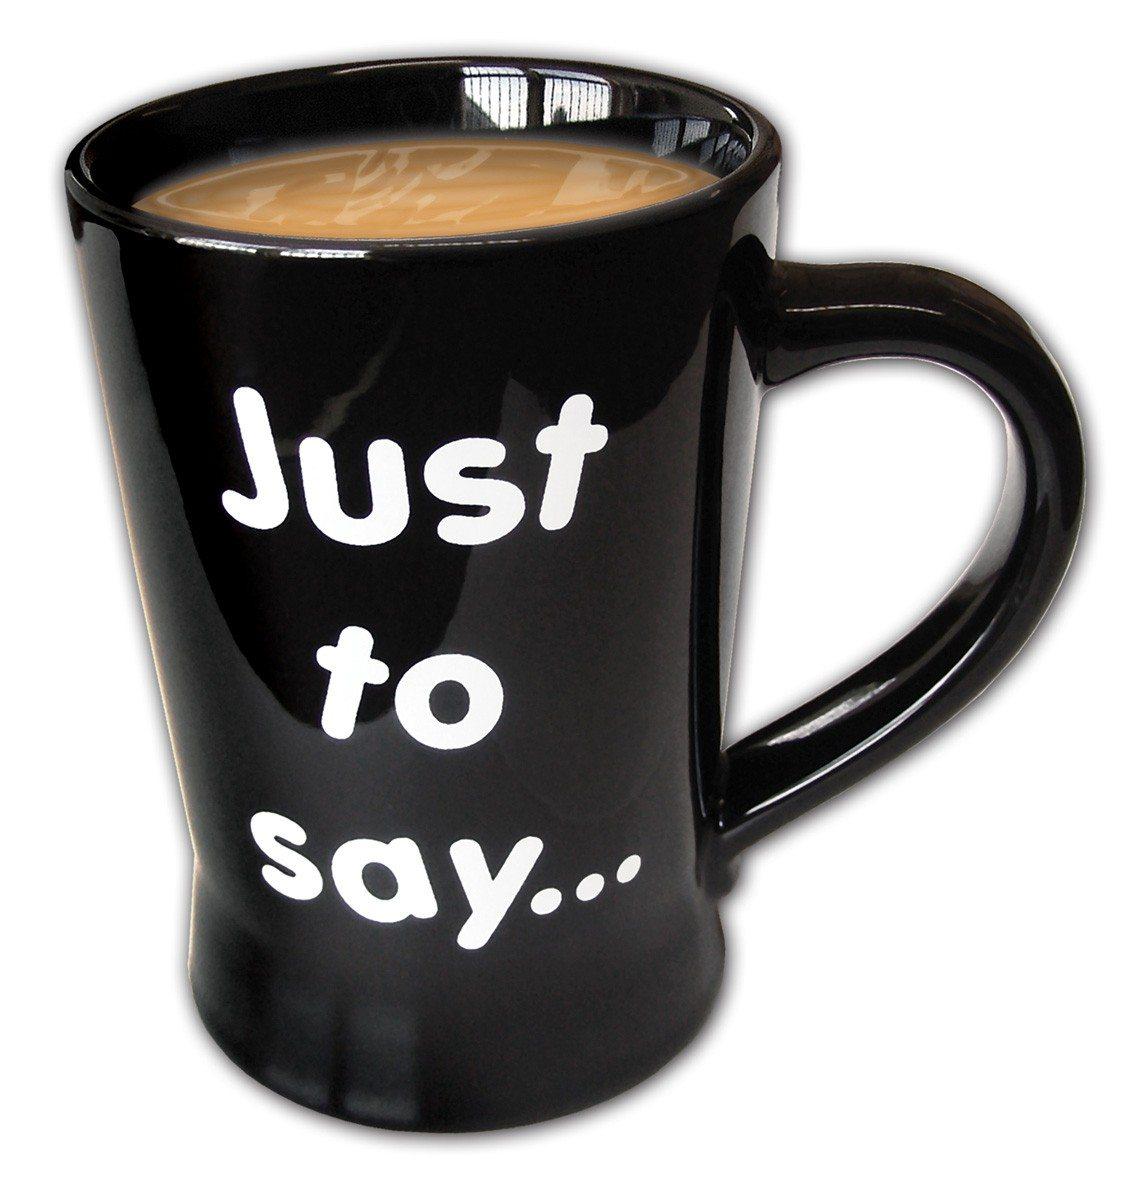 Talende kaffekrus